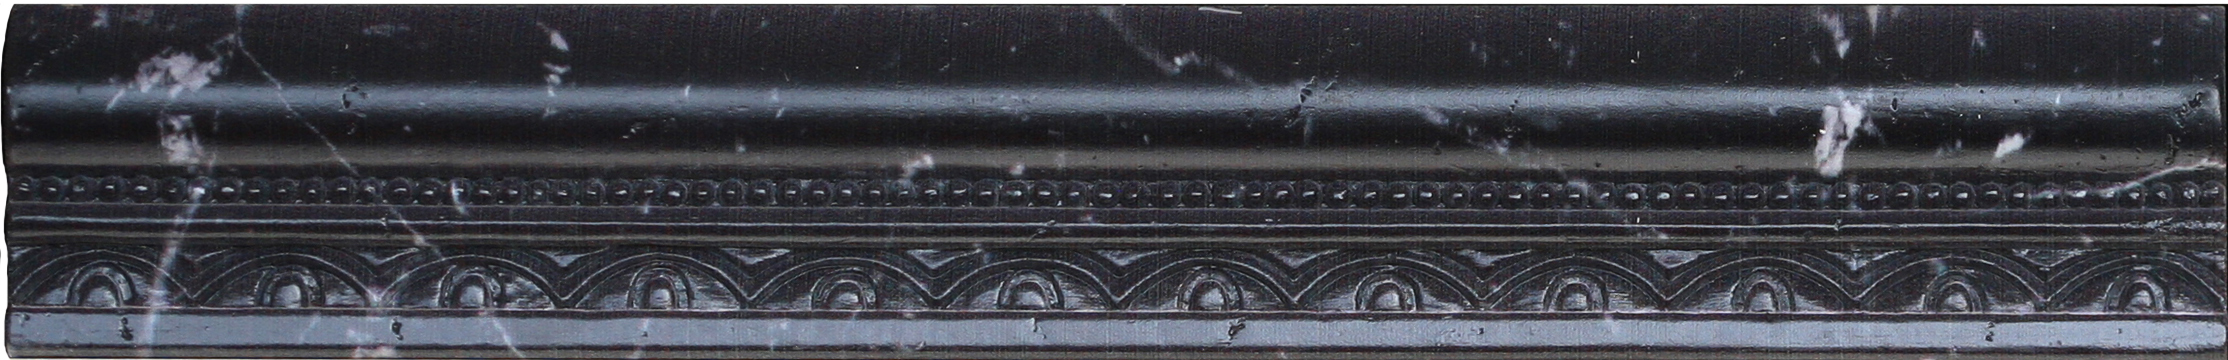 Бордюр Aparici +12880 EMILE MARQUINA MOLD бордюр aparici tolstoi emile marquina zocalo 20x25 1